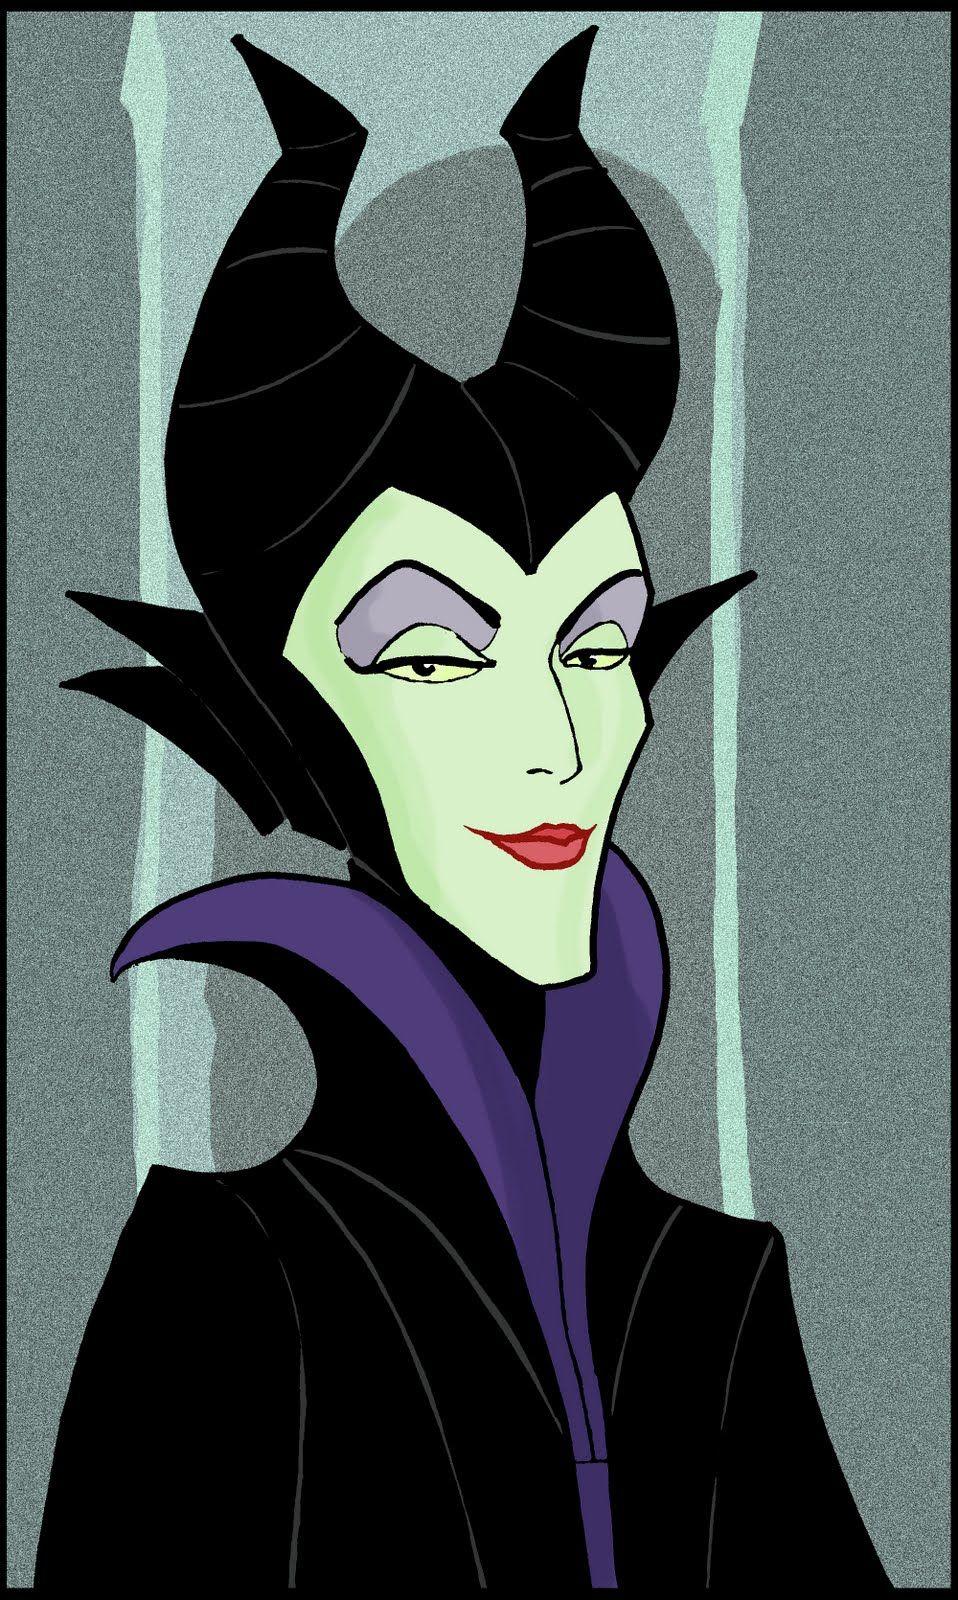 Drawbridge Sleeping Beauty Maleficent Maleficent